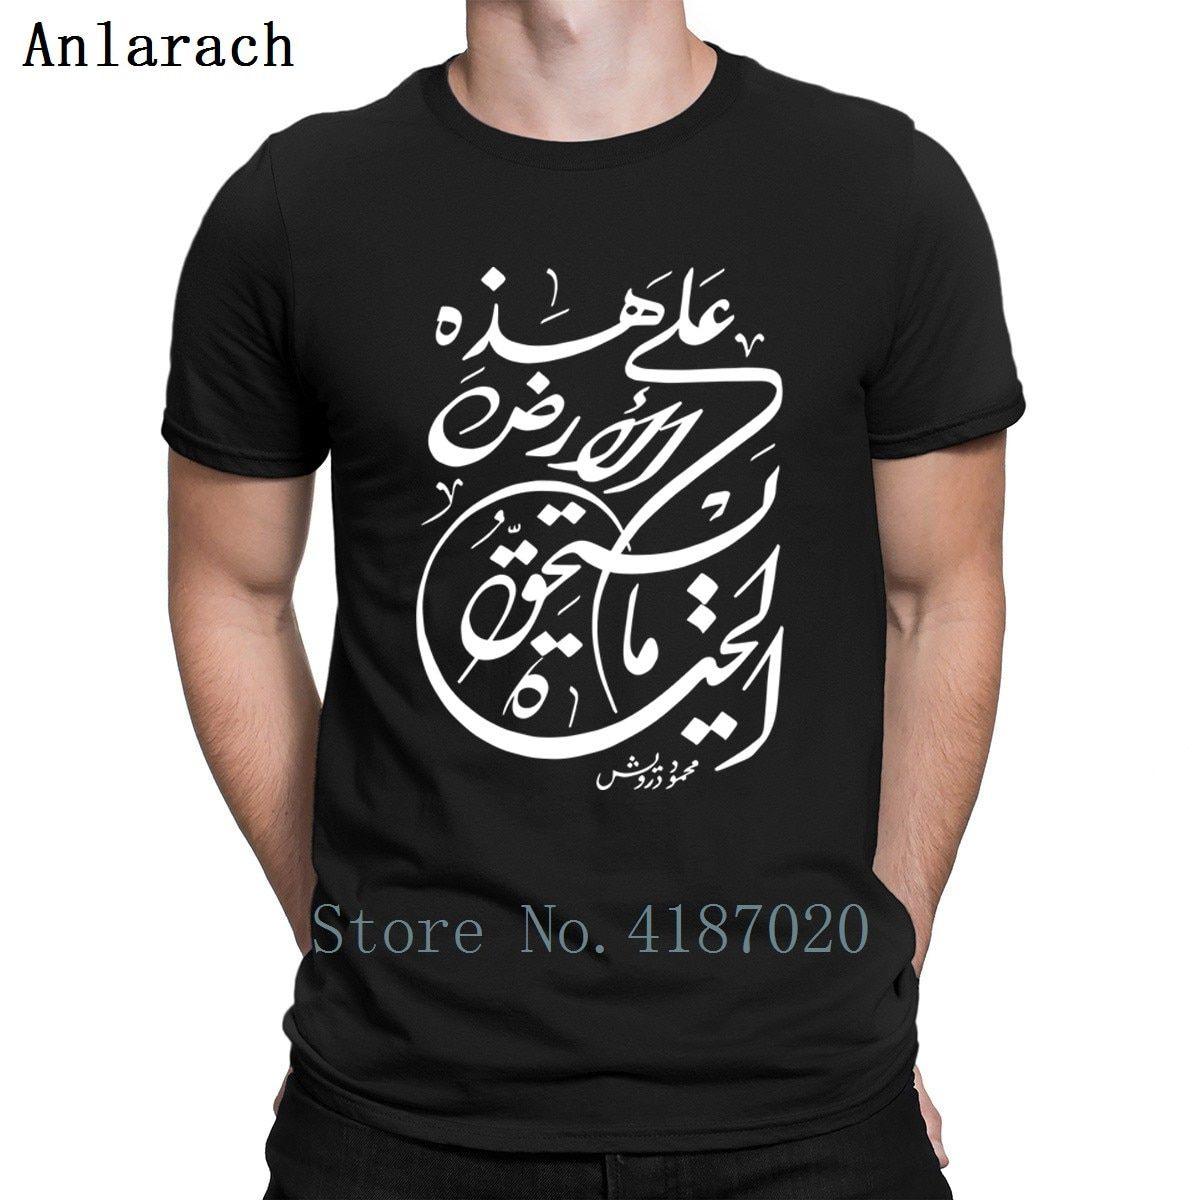 9fb584bb Arabic Calligraphy T-Shirt Clothes Funny Casual Top Quality Custom T Shirt  For Men Crew